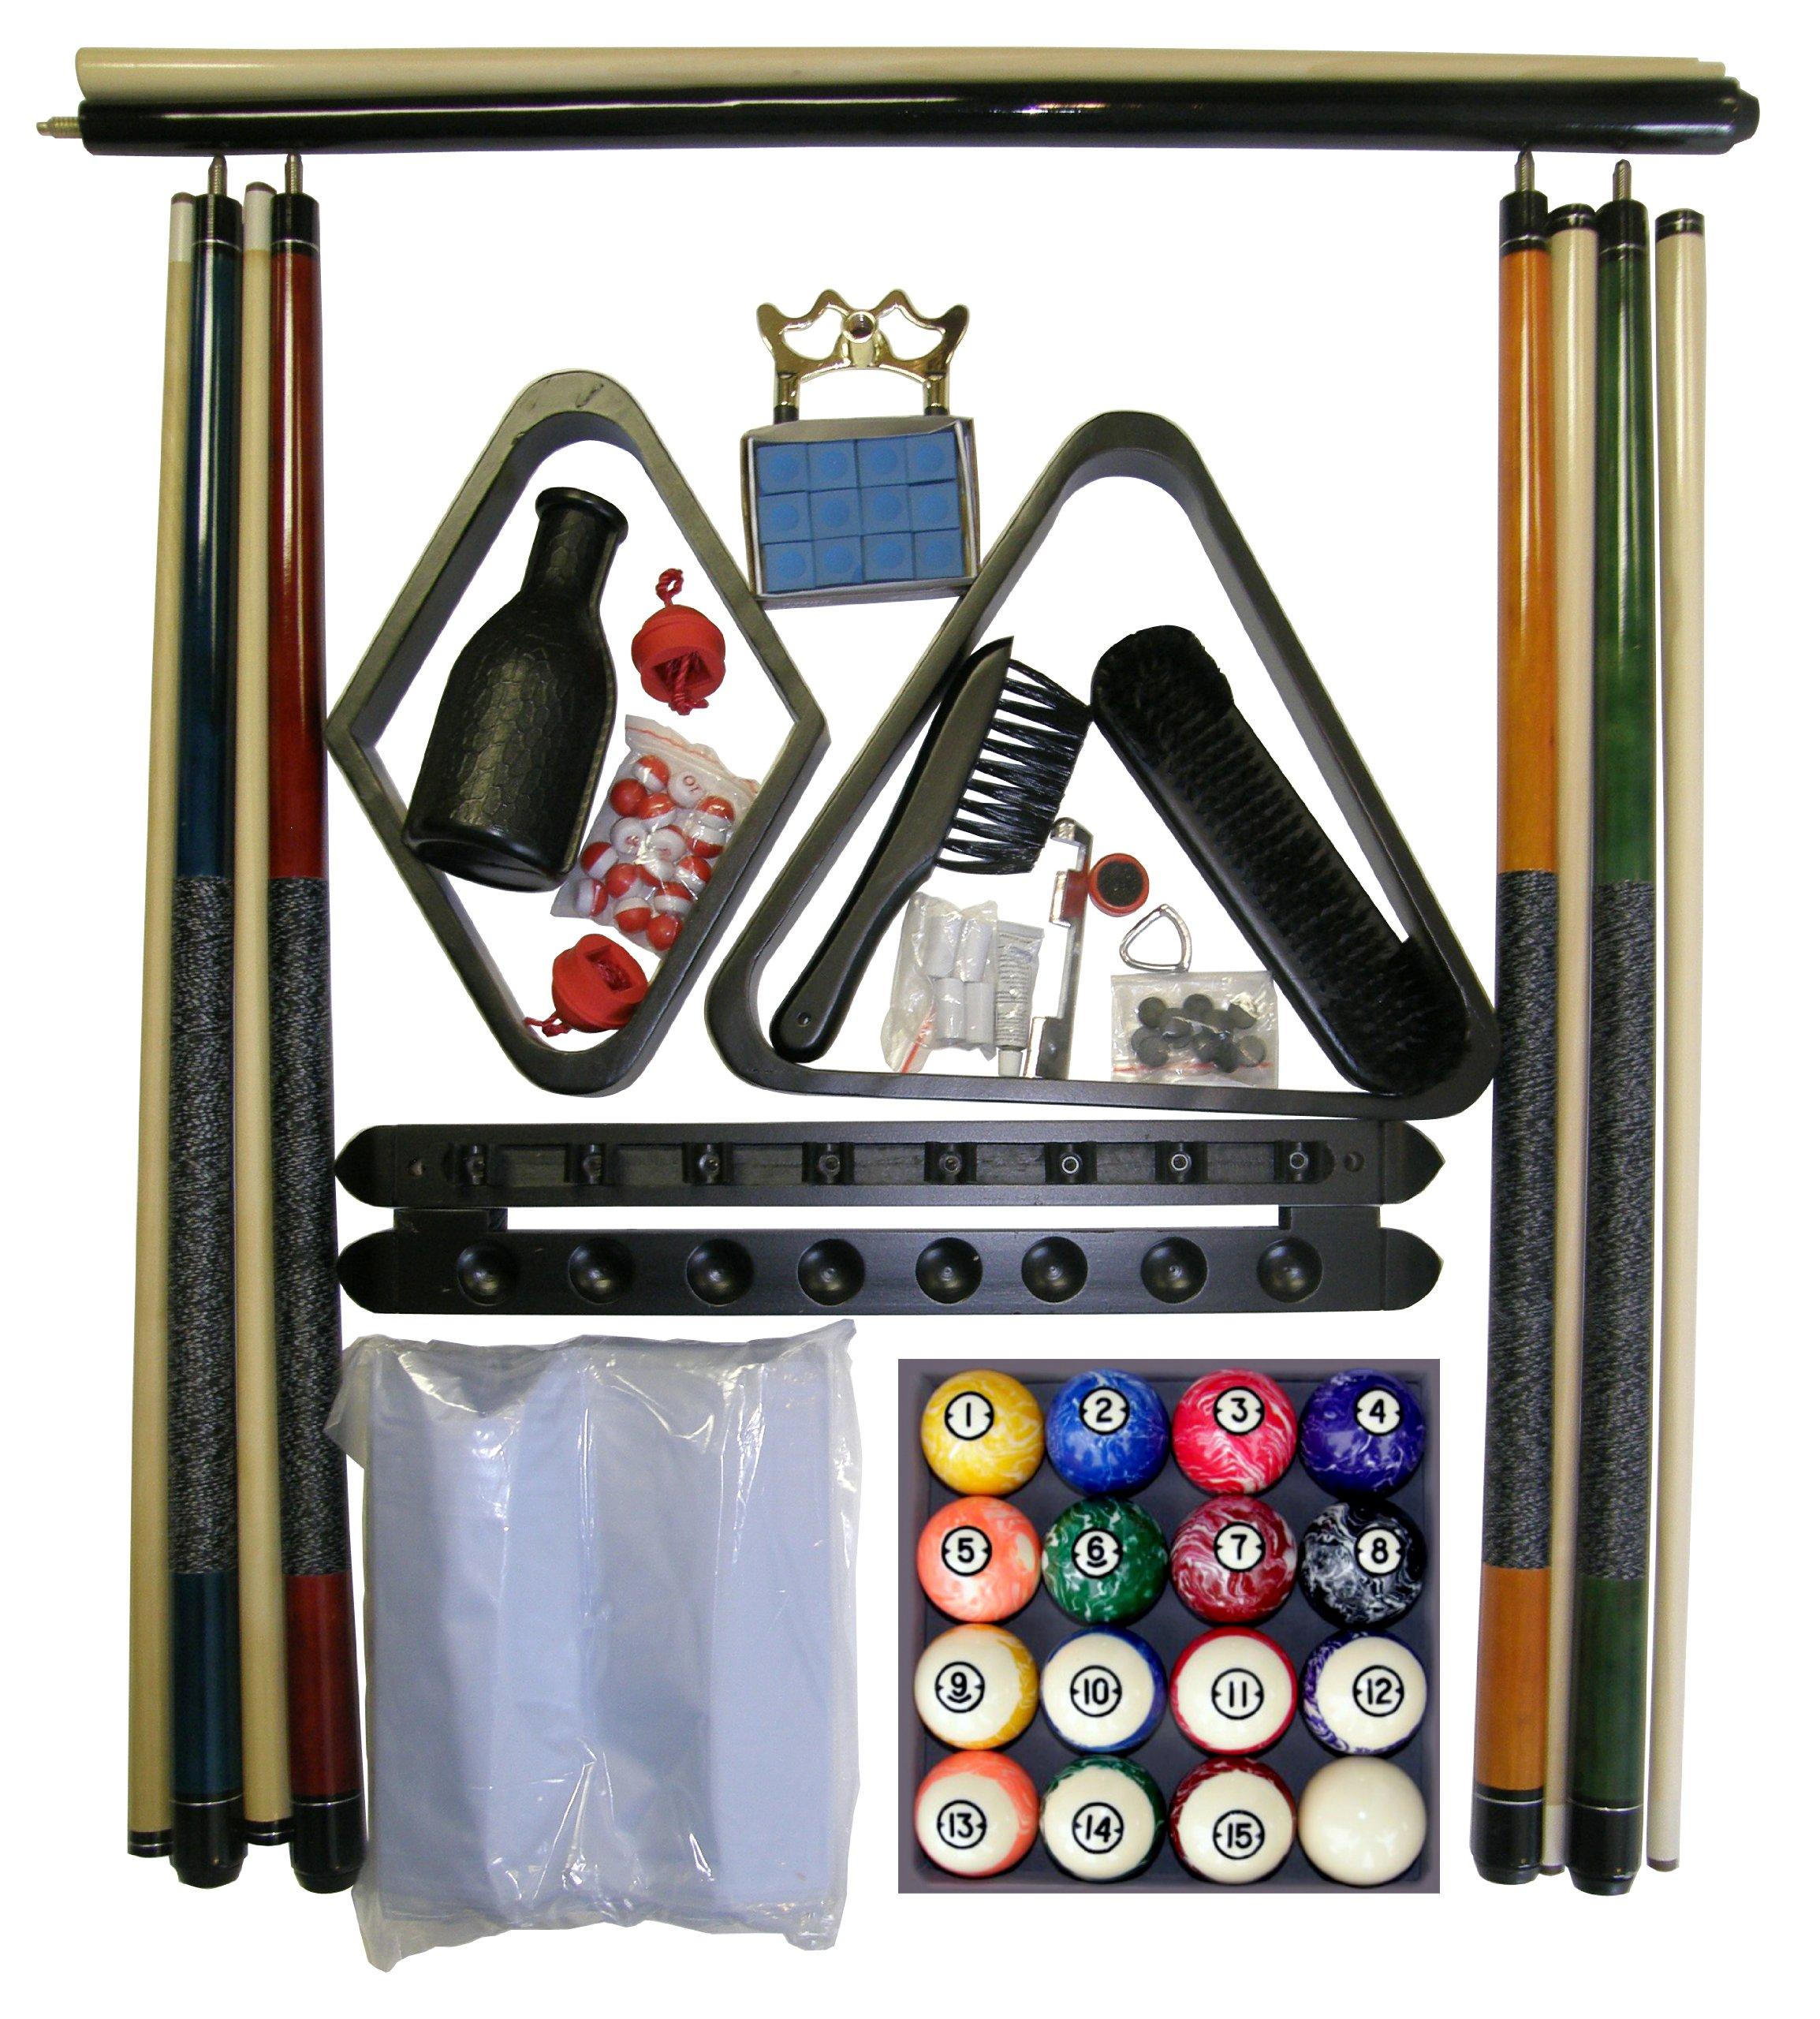 Black Finish Billiard Pool Table Accessory Kit W Classic Marble Ball Set